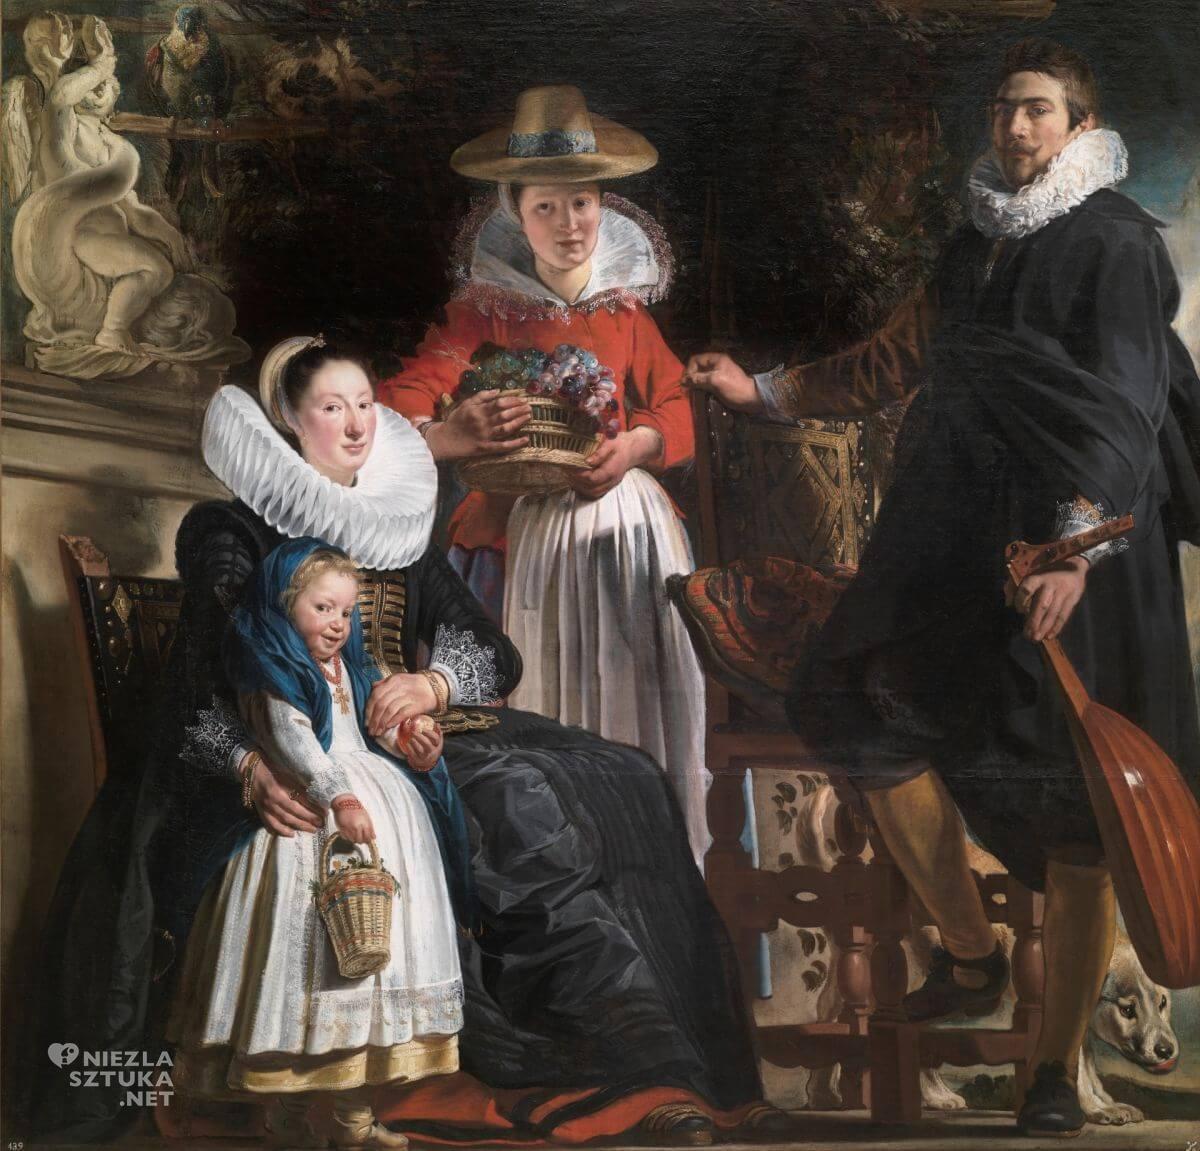 Jacob Jordaens, Autoportret z rodziną, sztuka flamandzka, malarstwo flamandzkie, autoportret, Niezła sztuka